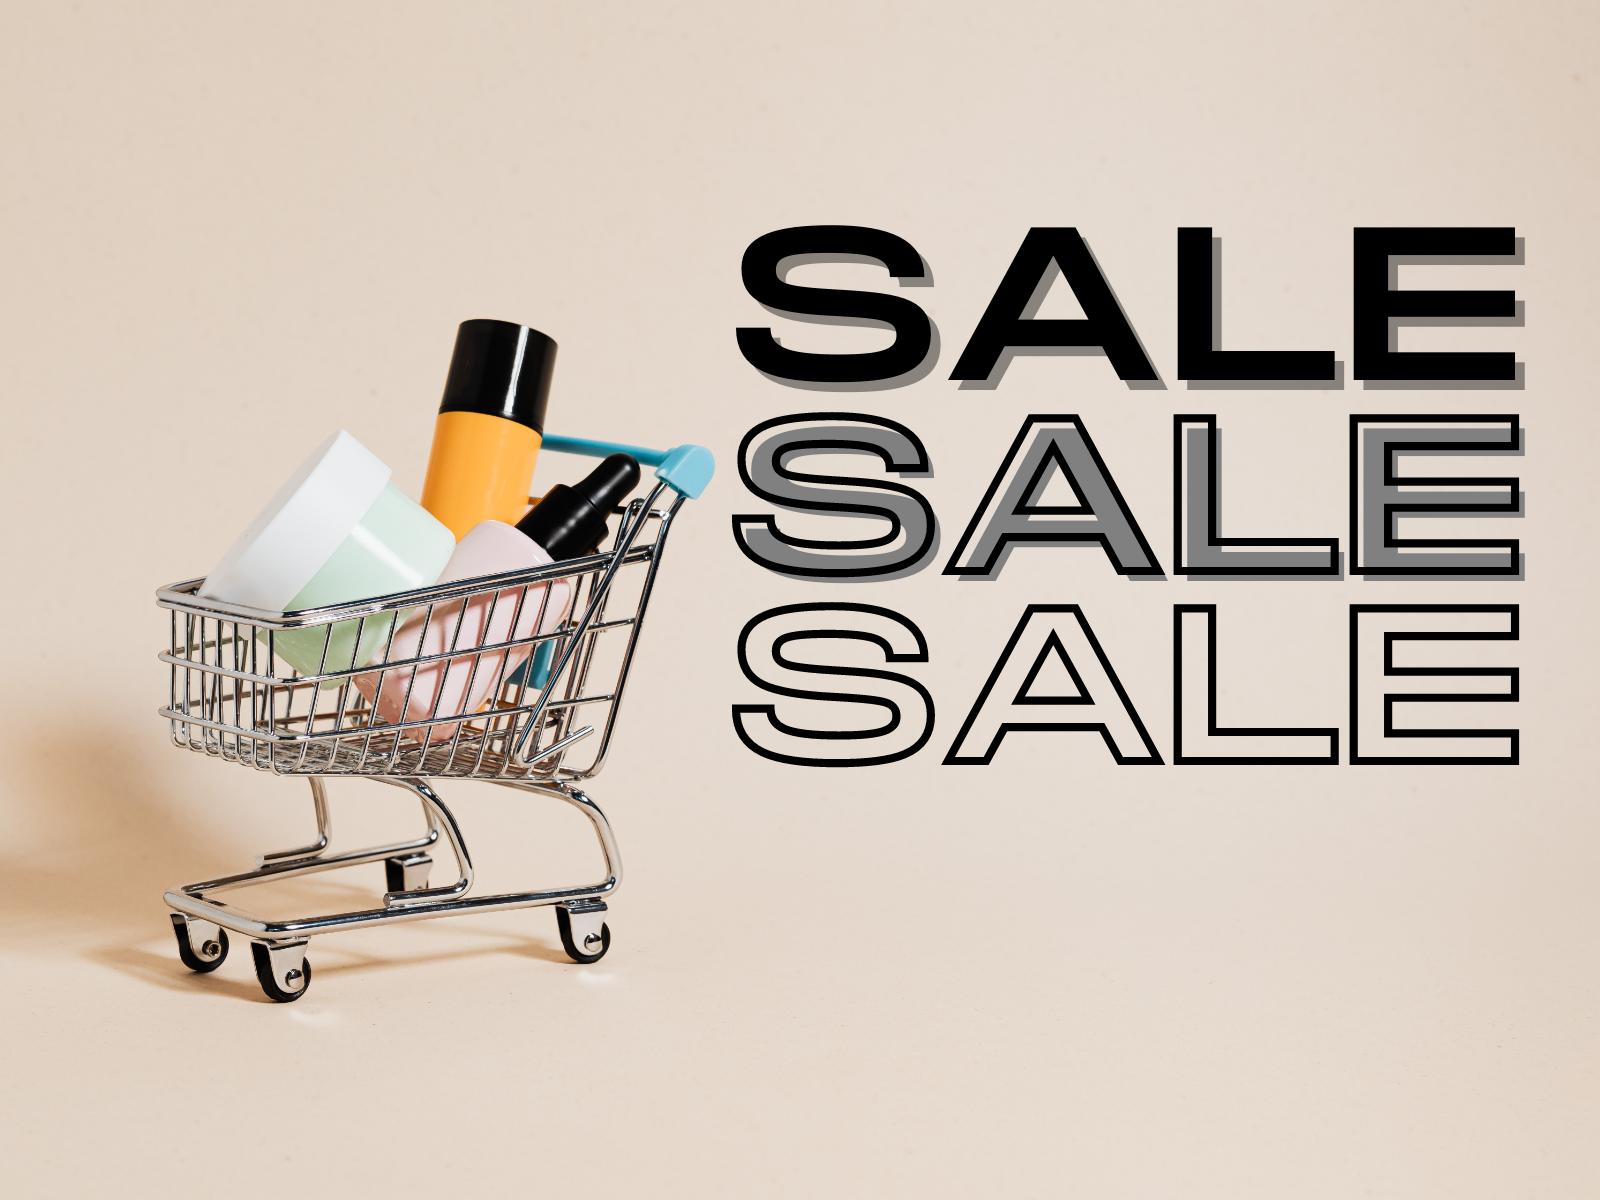 Manfaat Merencanakan Promosi Penjualan Berkelanjutan Jojonomic Pro The Number 1 Expense Management Solution On Your Mobile